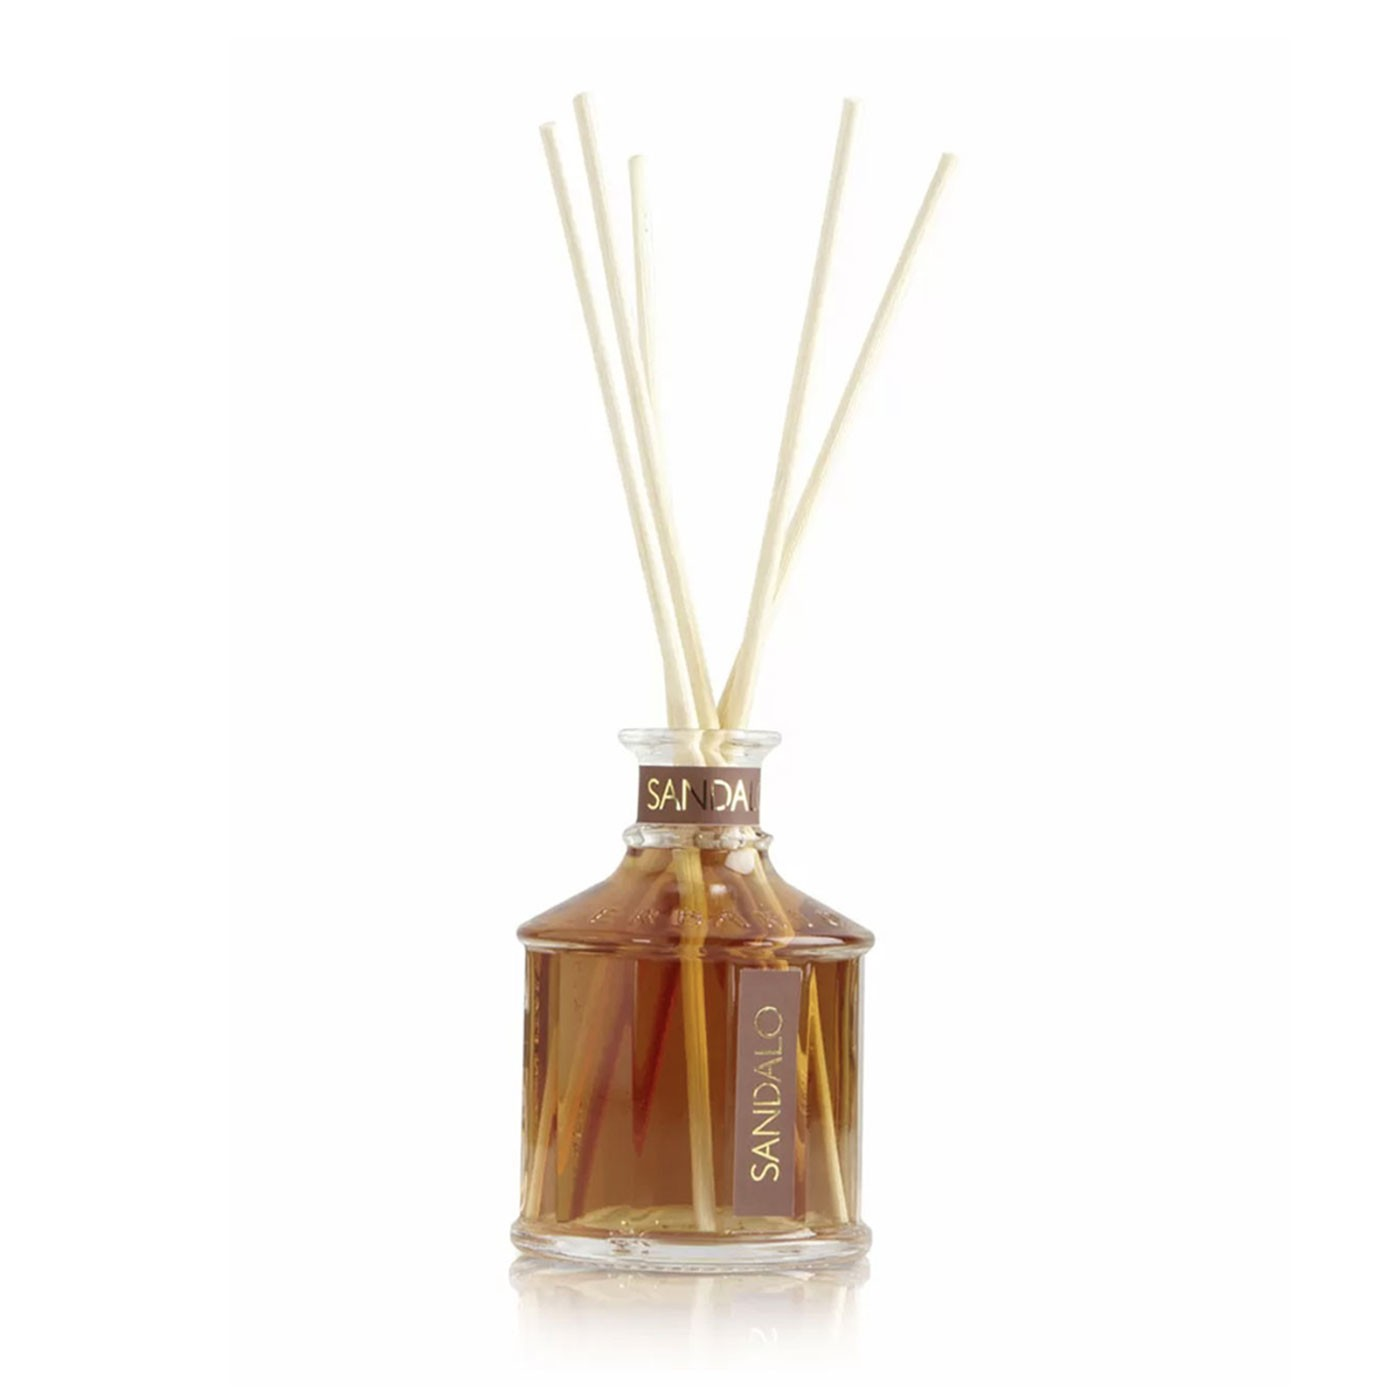 Sandalwood Fragrance Diffuser 34 oz